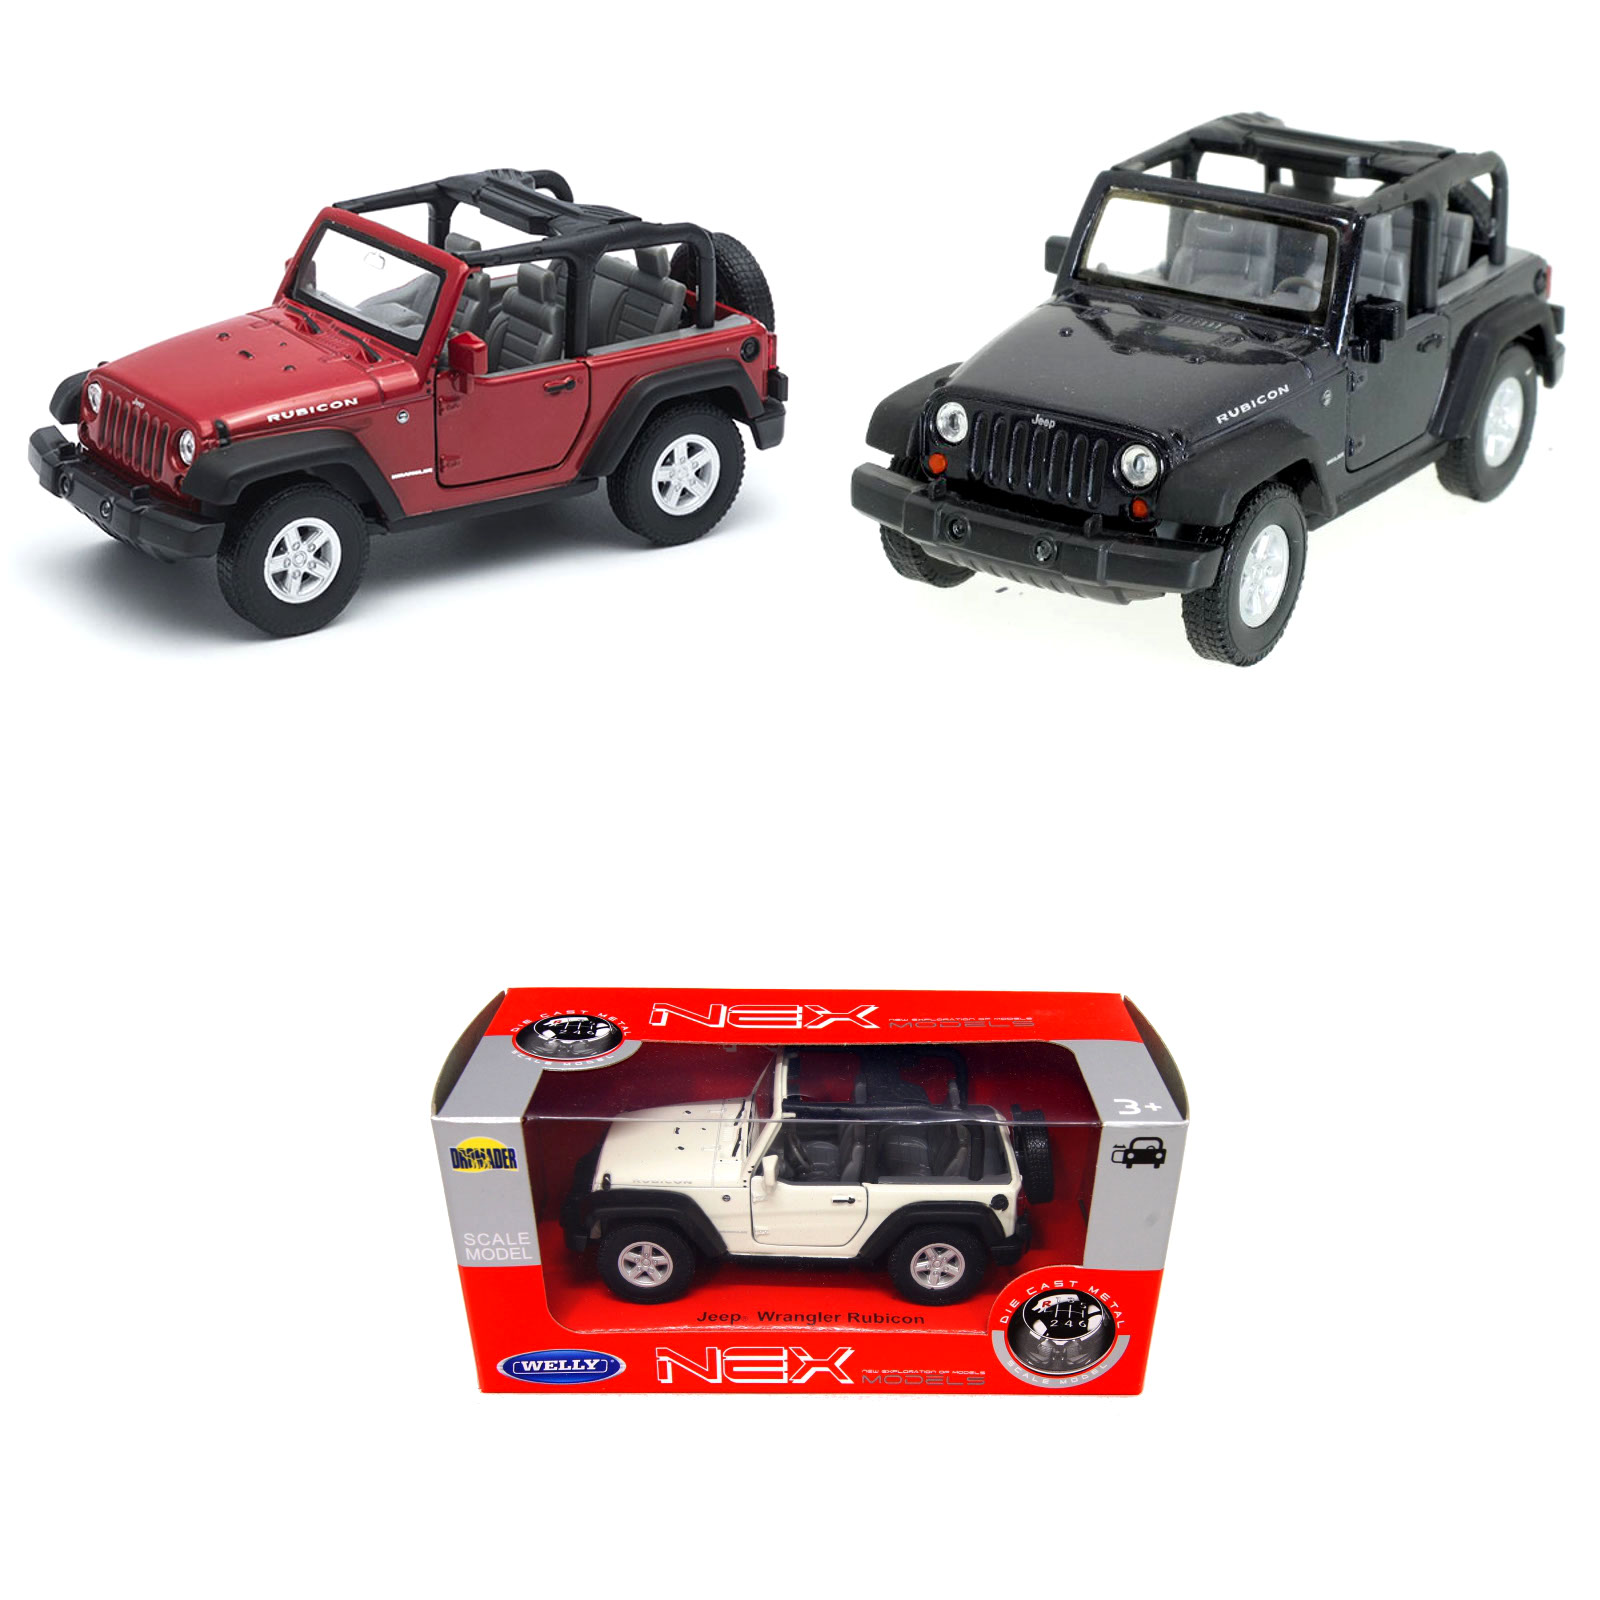 Модель машины Jeep Wrangler Rubicon, 1:34-39Jeep<br>Модель машины Jeep Wrangler Rubicon, 1:34-39<br>